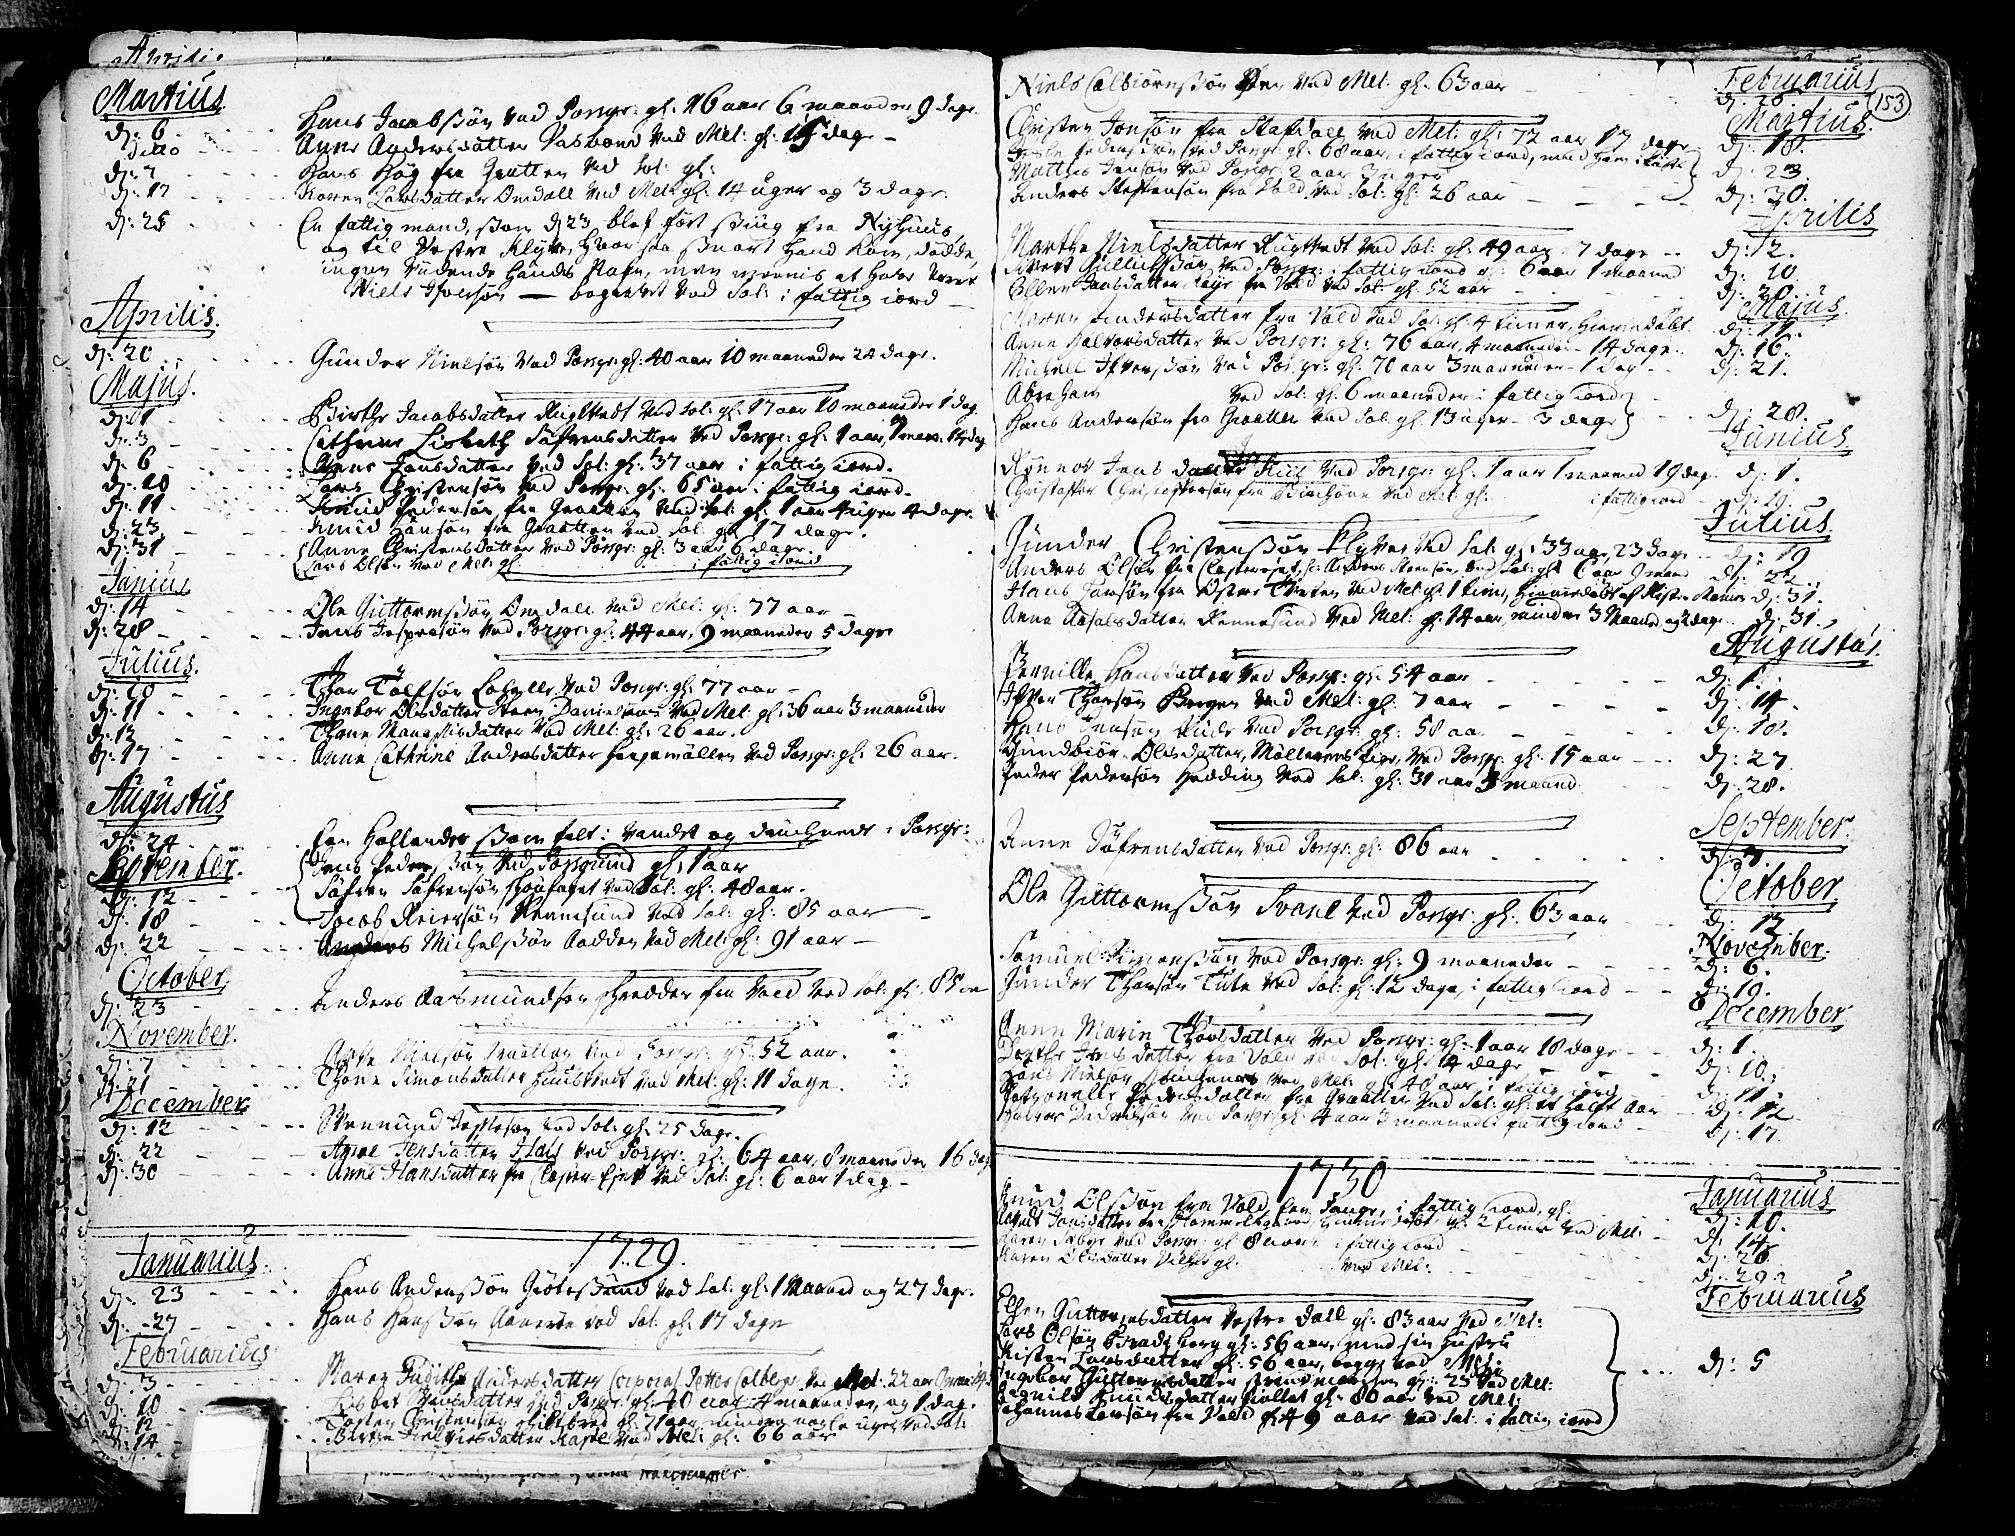 SAKO, Solum kirkebøker, F/Fa/L0002: Ministerialbok nr. I 2, 1713-1761, s. 153